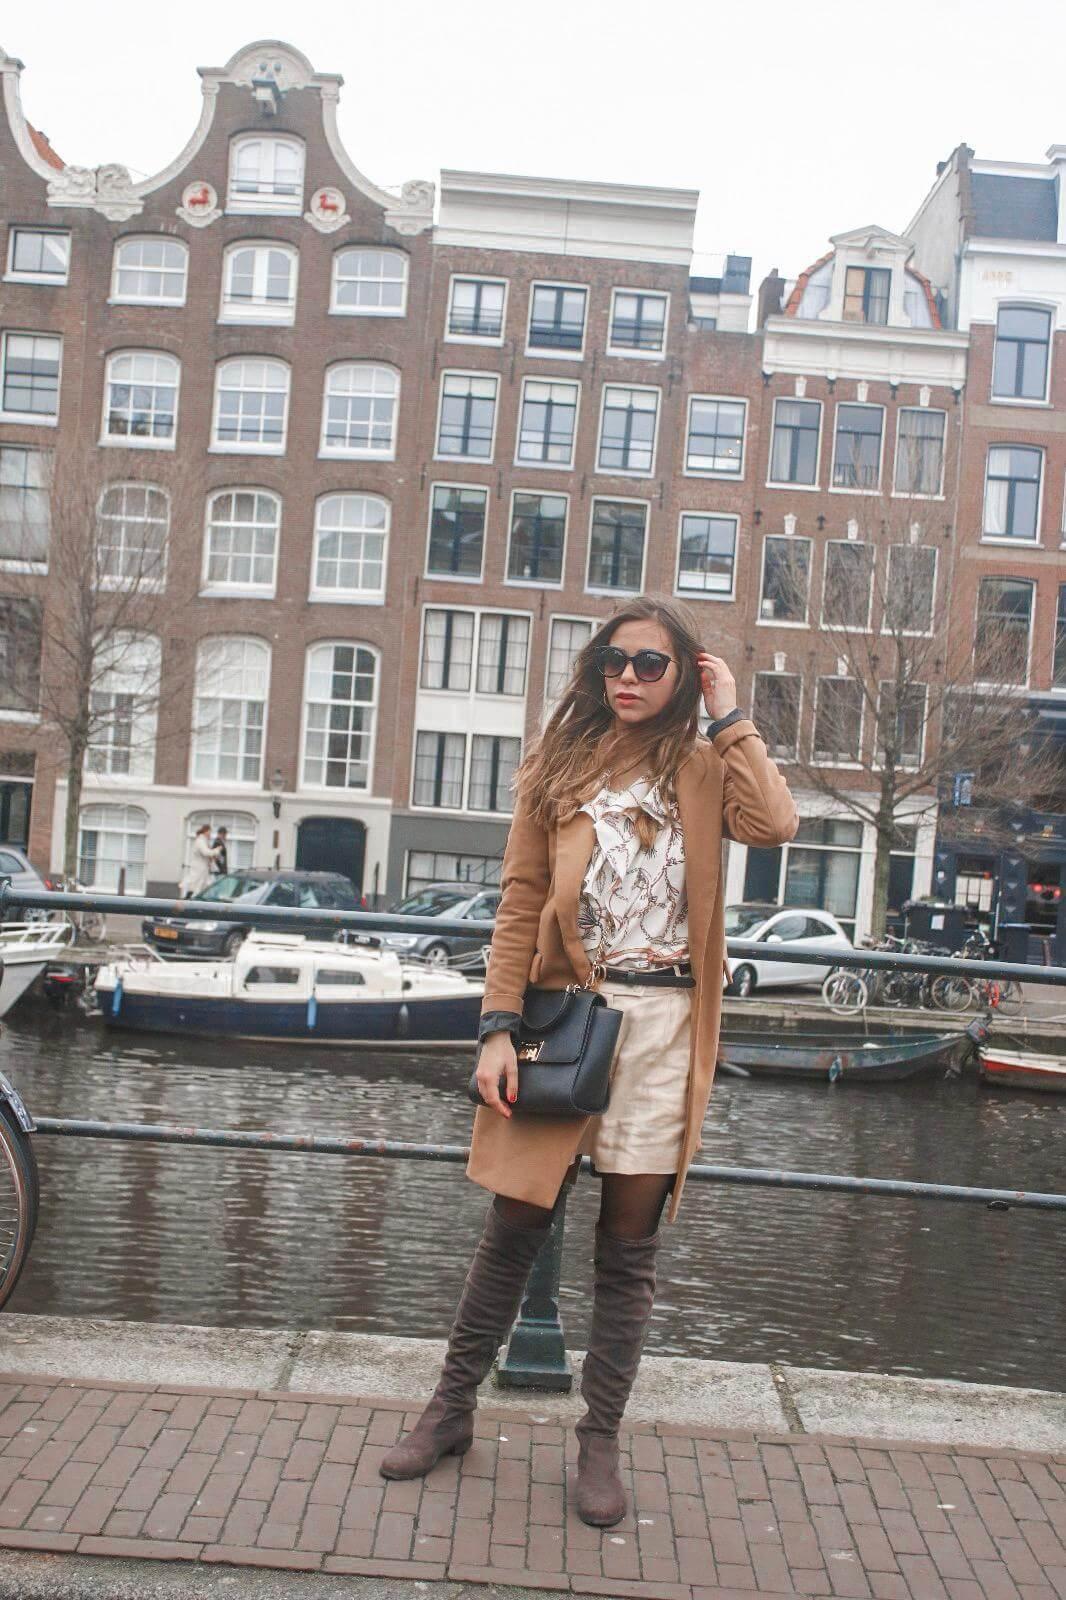 Frühlingsoutfit – Scarf Print, Goldene Shorts und Overknee Boots, brauner Mantel